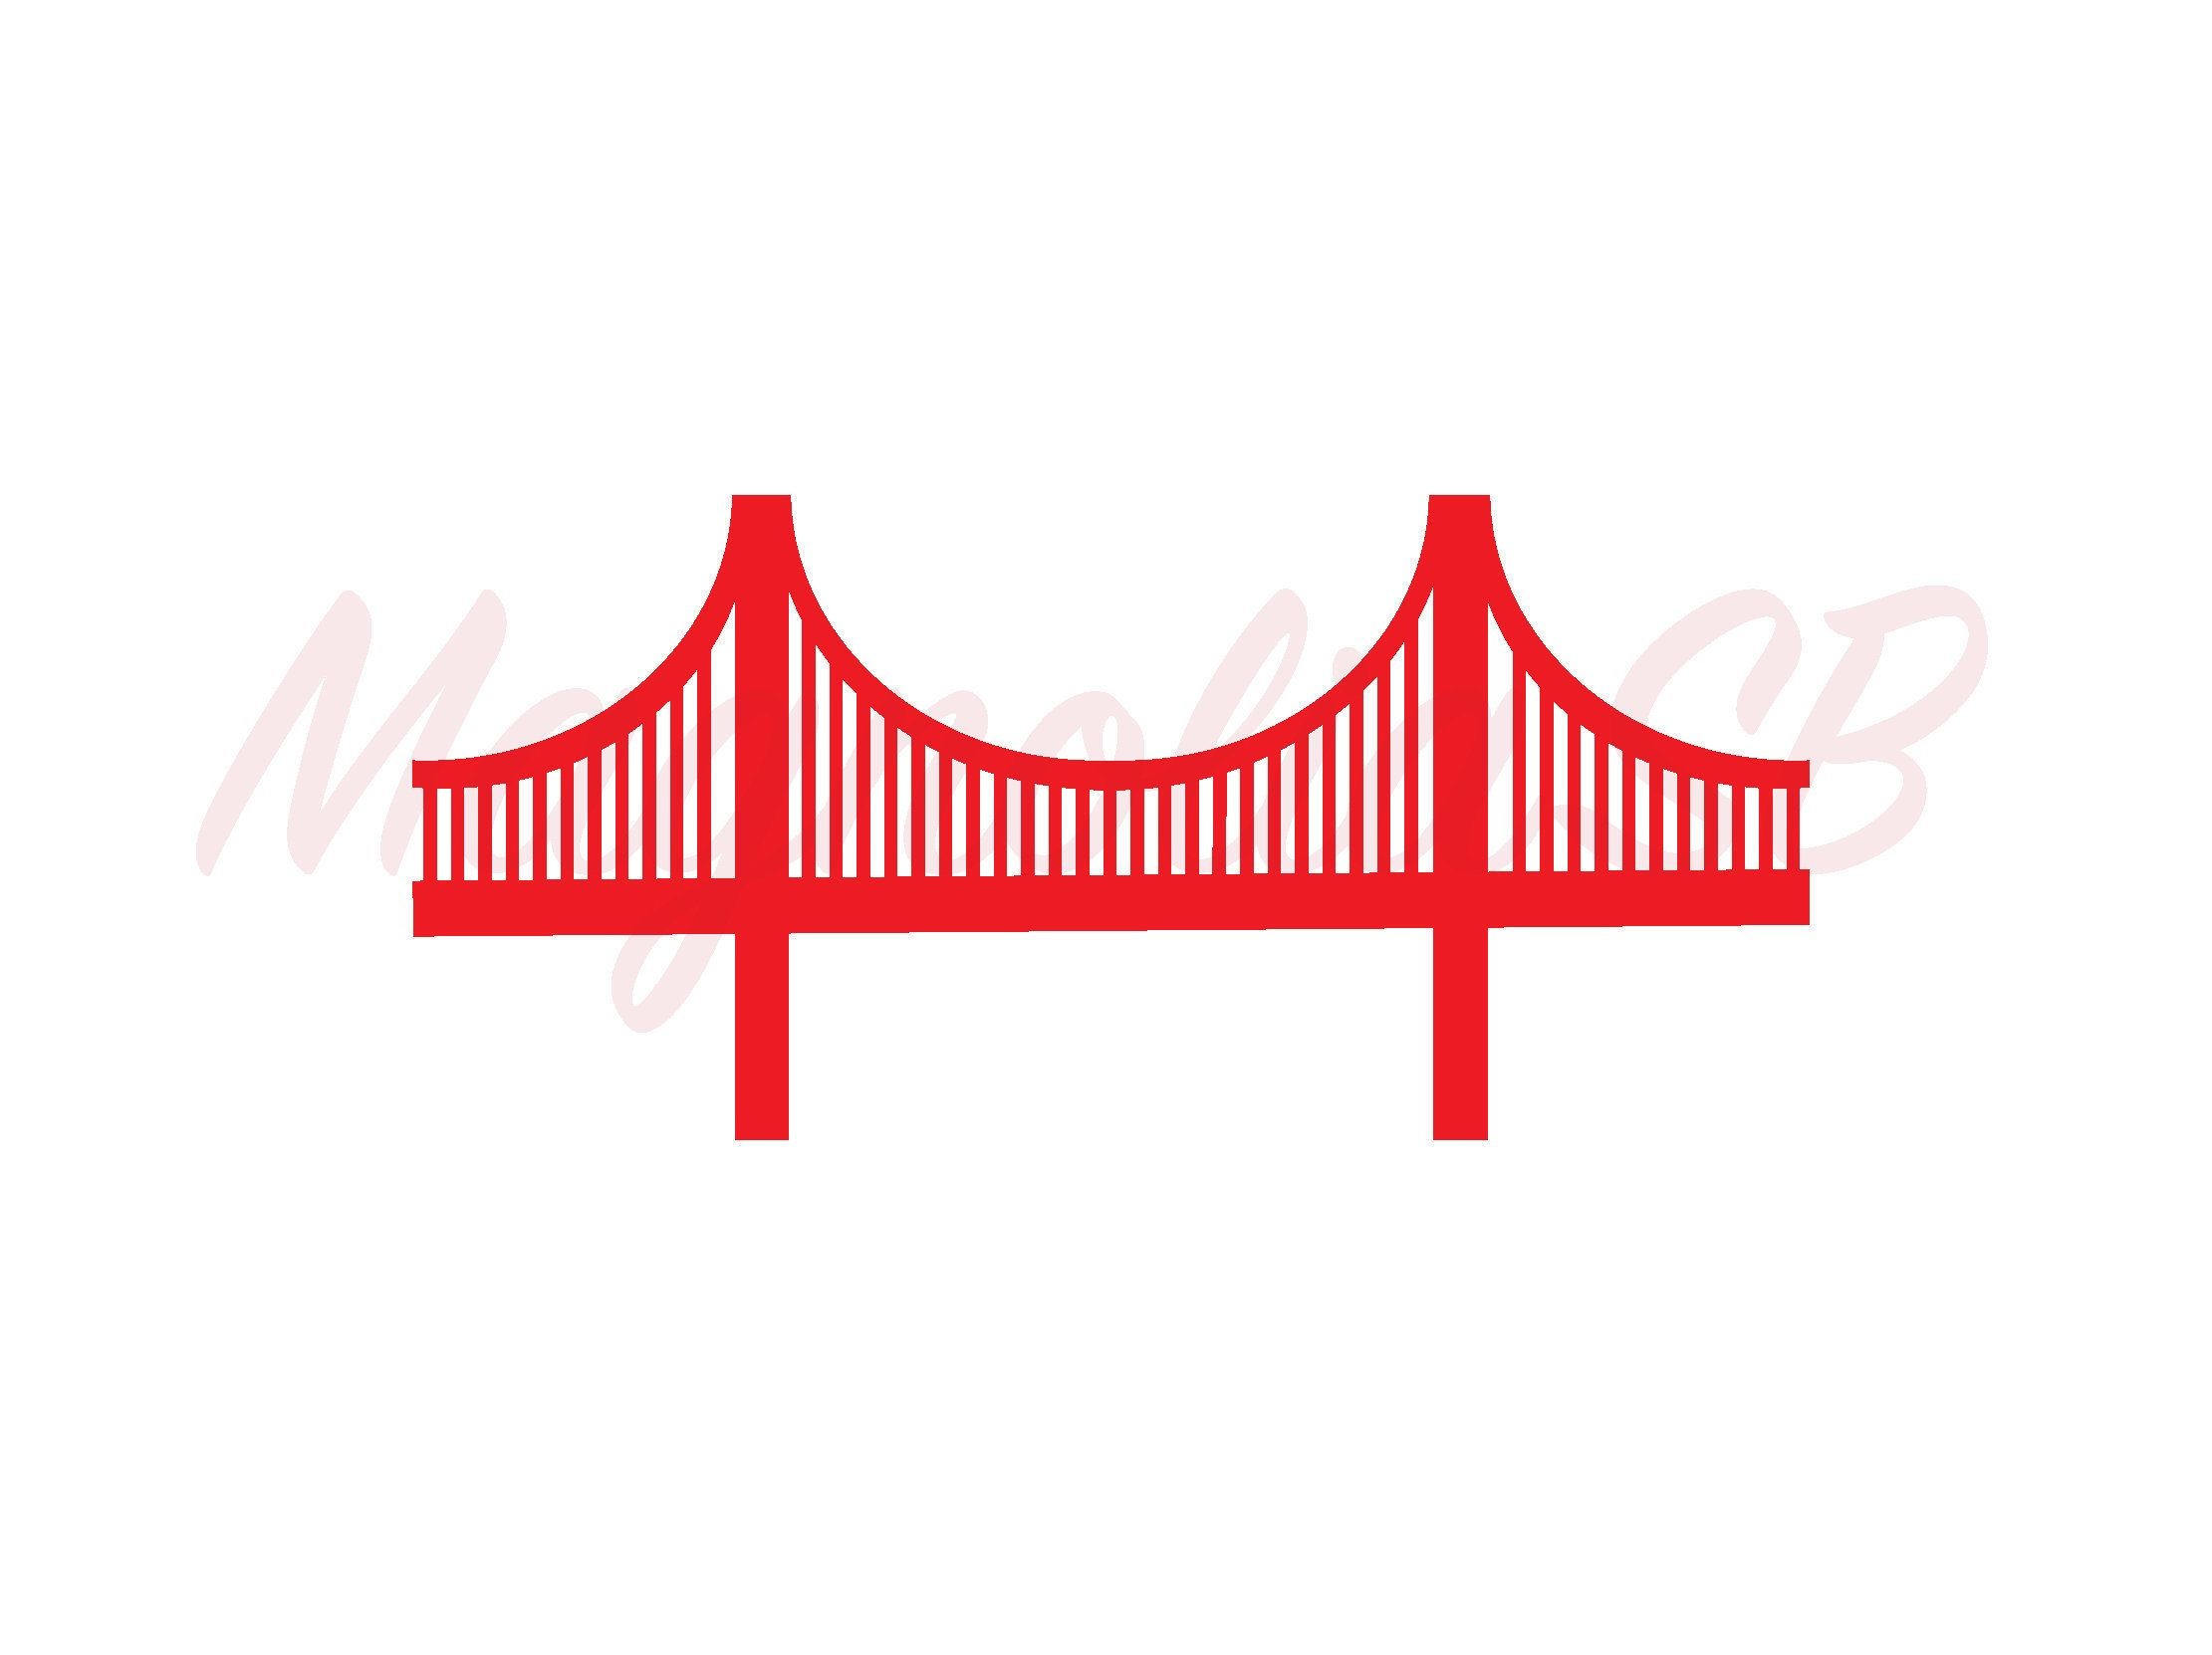 hight resolution of golden gate bridge svg golden gate bridge dxf golden gate bridge clipart